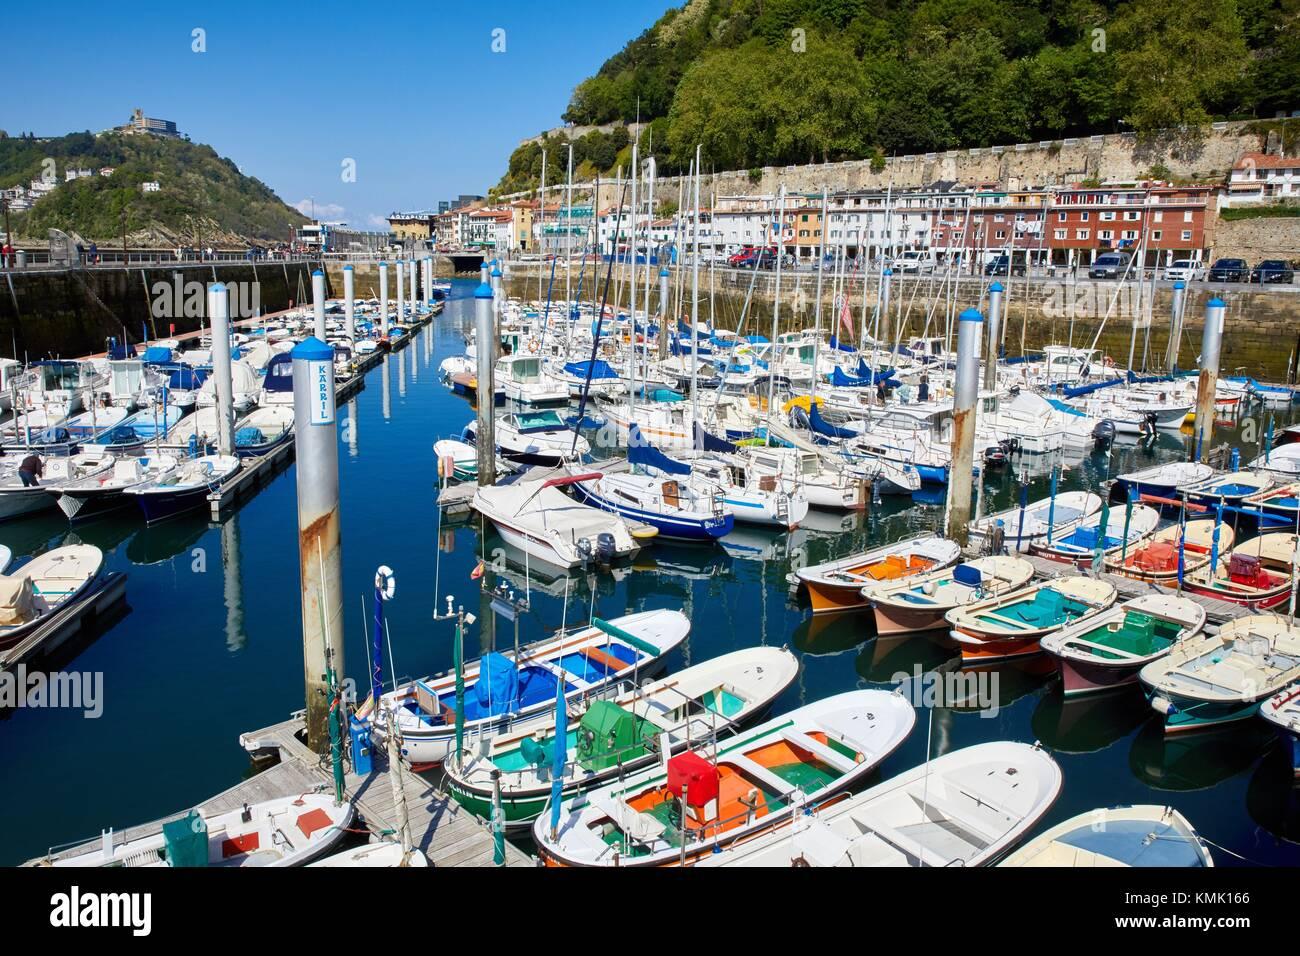 Port, Donostia, San Sebastian, Gipuzkoa, Basque Country, Spain - Stock Image